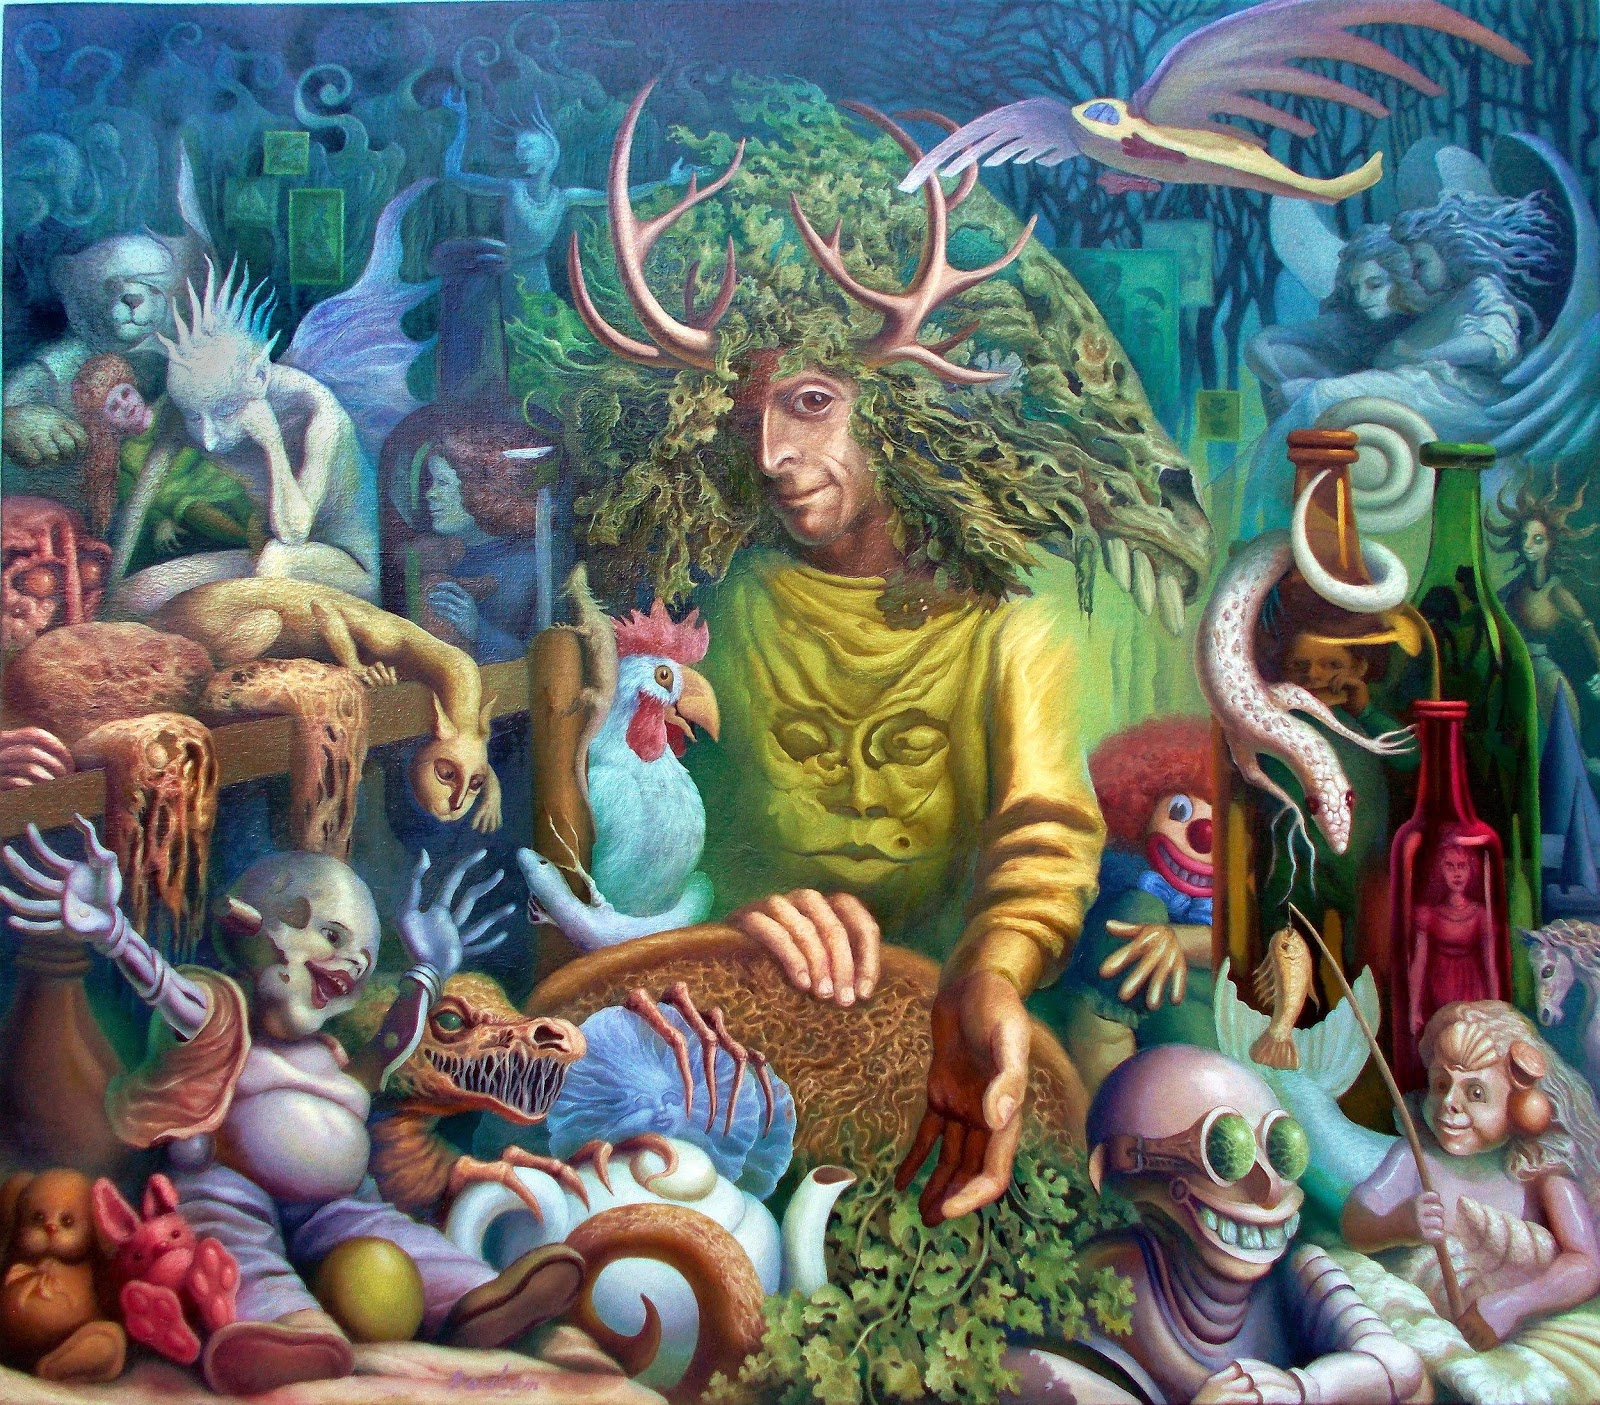 Paintings by Elizabeth Barsham - Paul SutherlandShane's Grassy Oppy, Oil on Canvas, 105 cm x 122 cm.